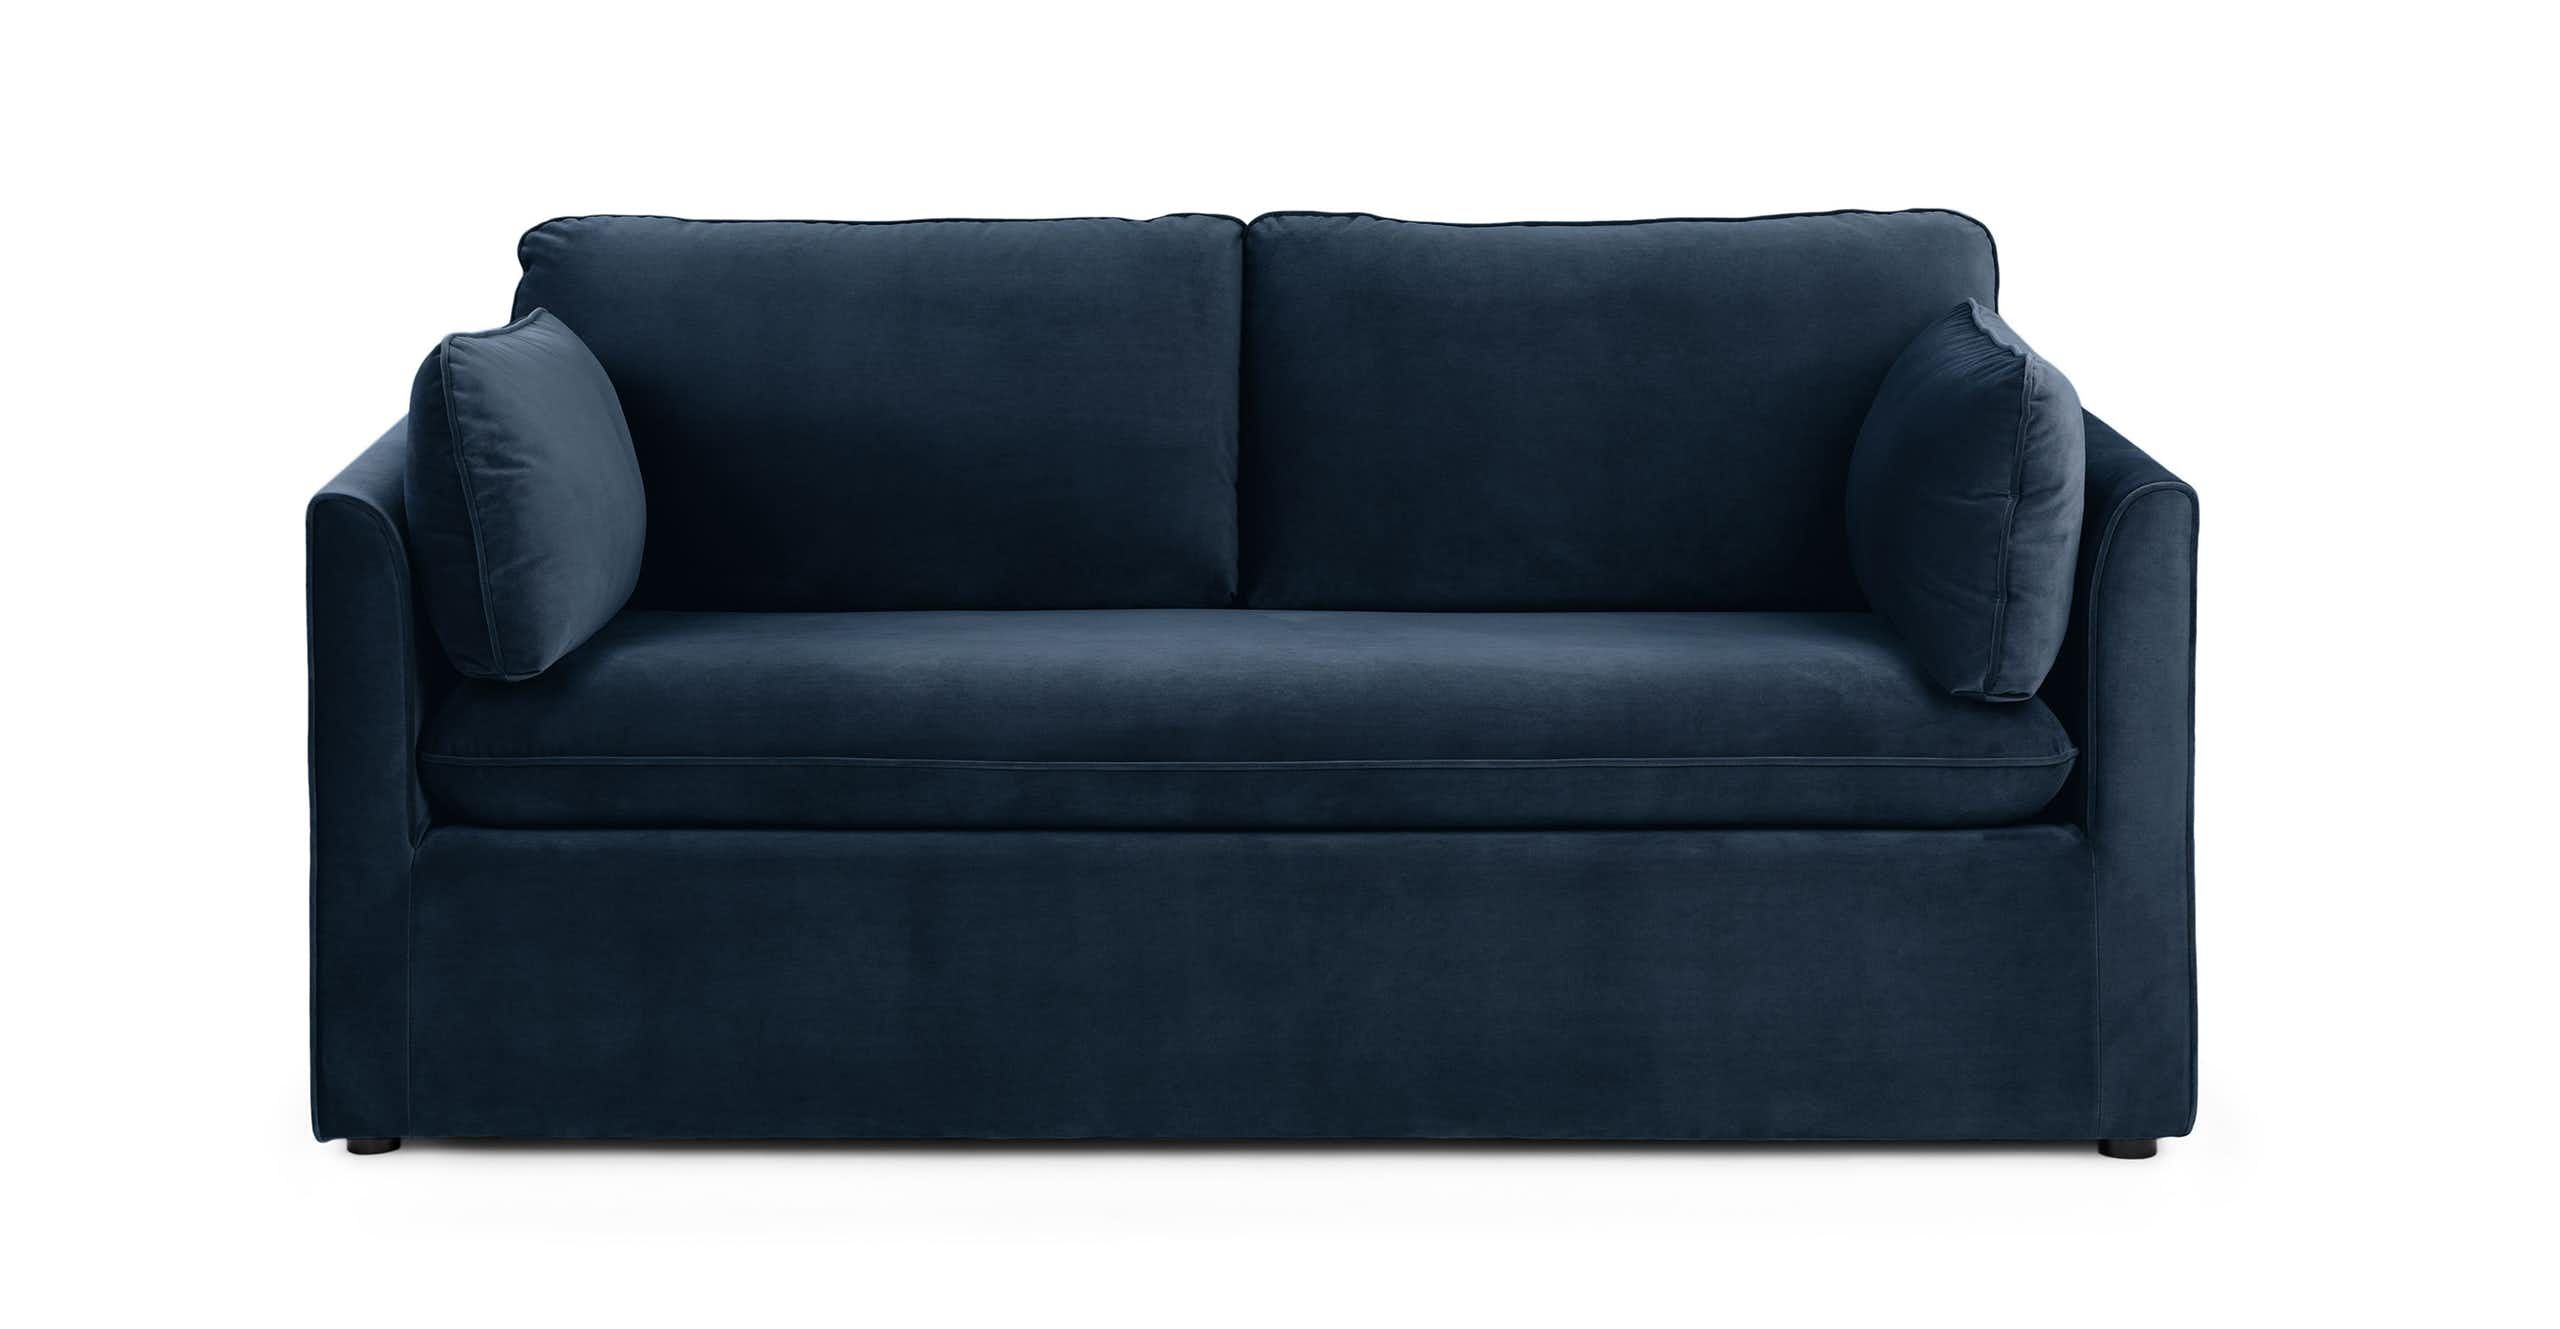 The Oneira Sofa Bed Modern Sleeper Sofa Mid Century Modern Sleeper Sofa Blue Sofa